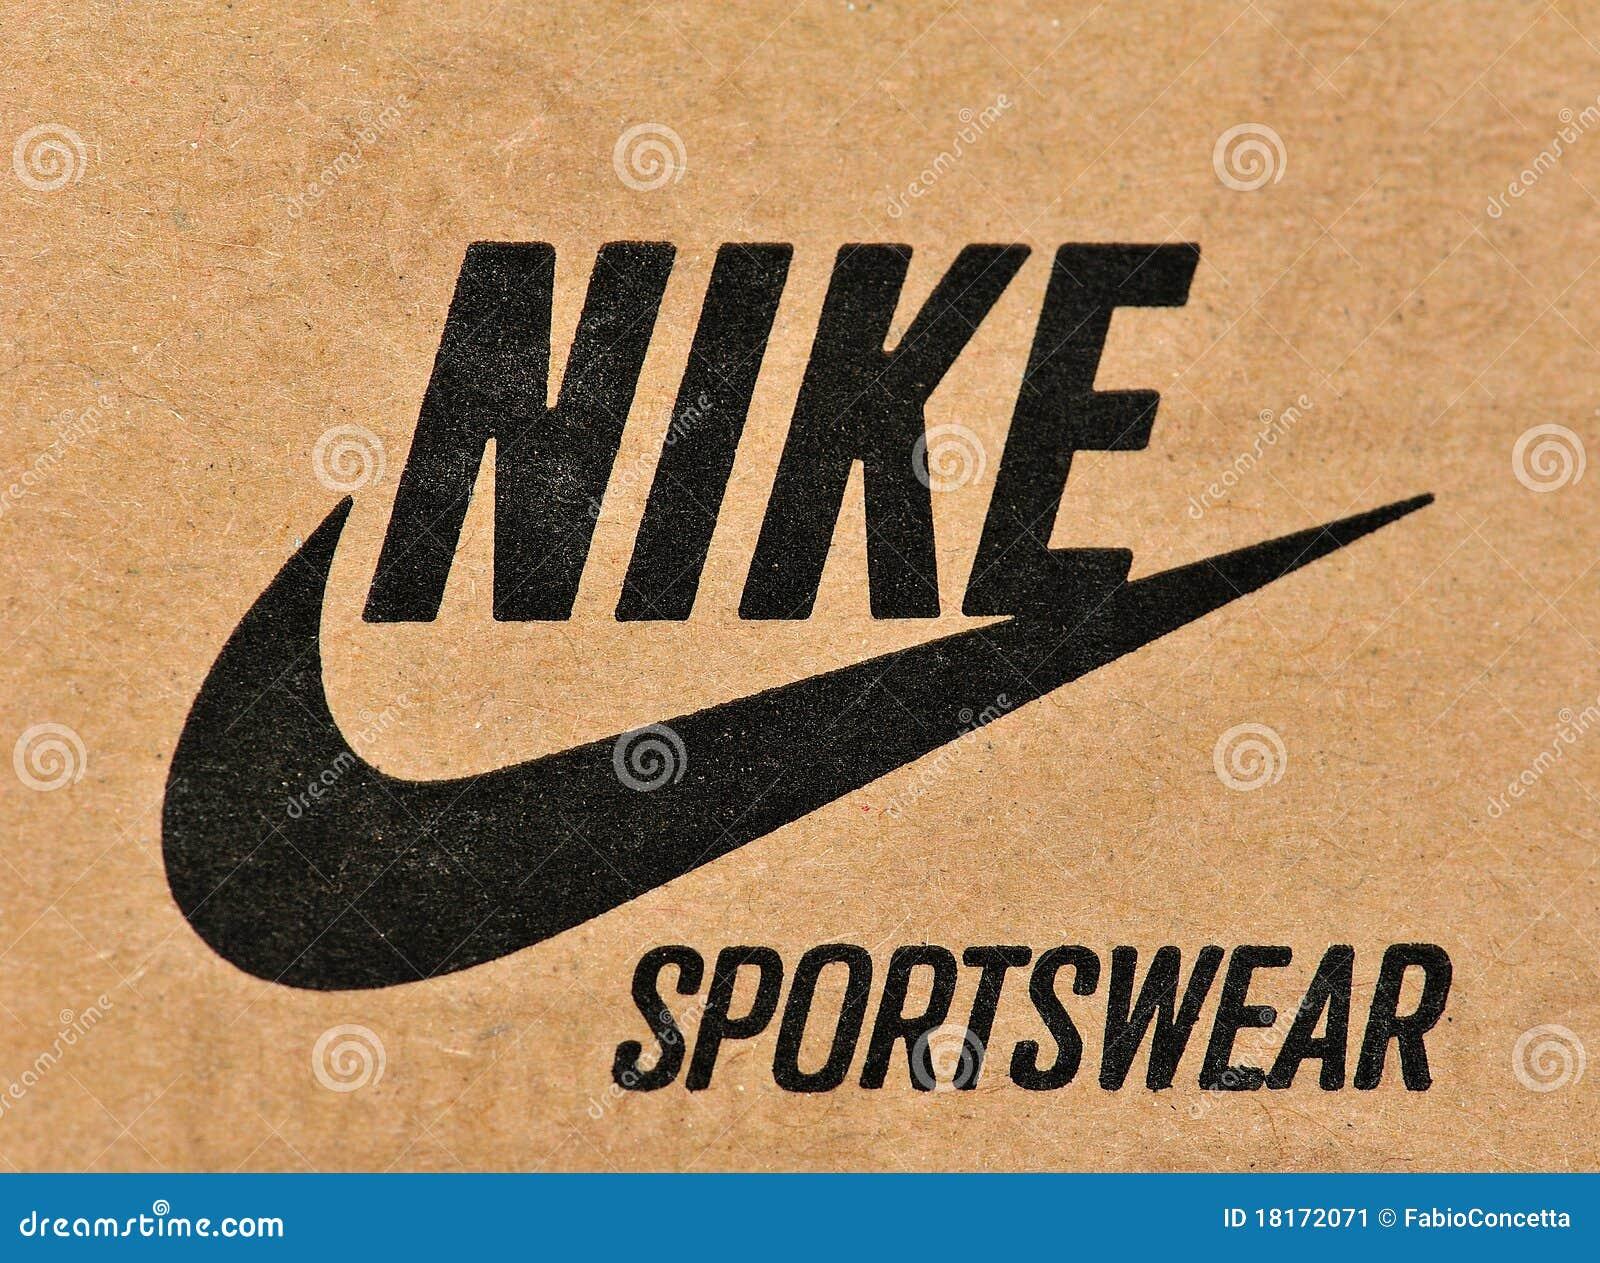 Nike brand and logo on cardboard